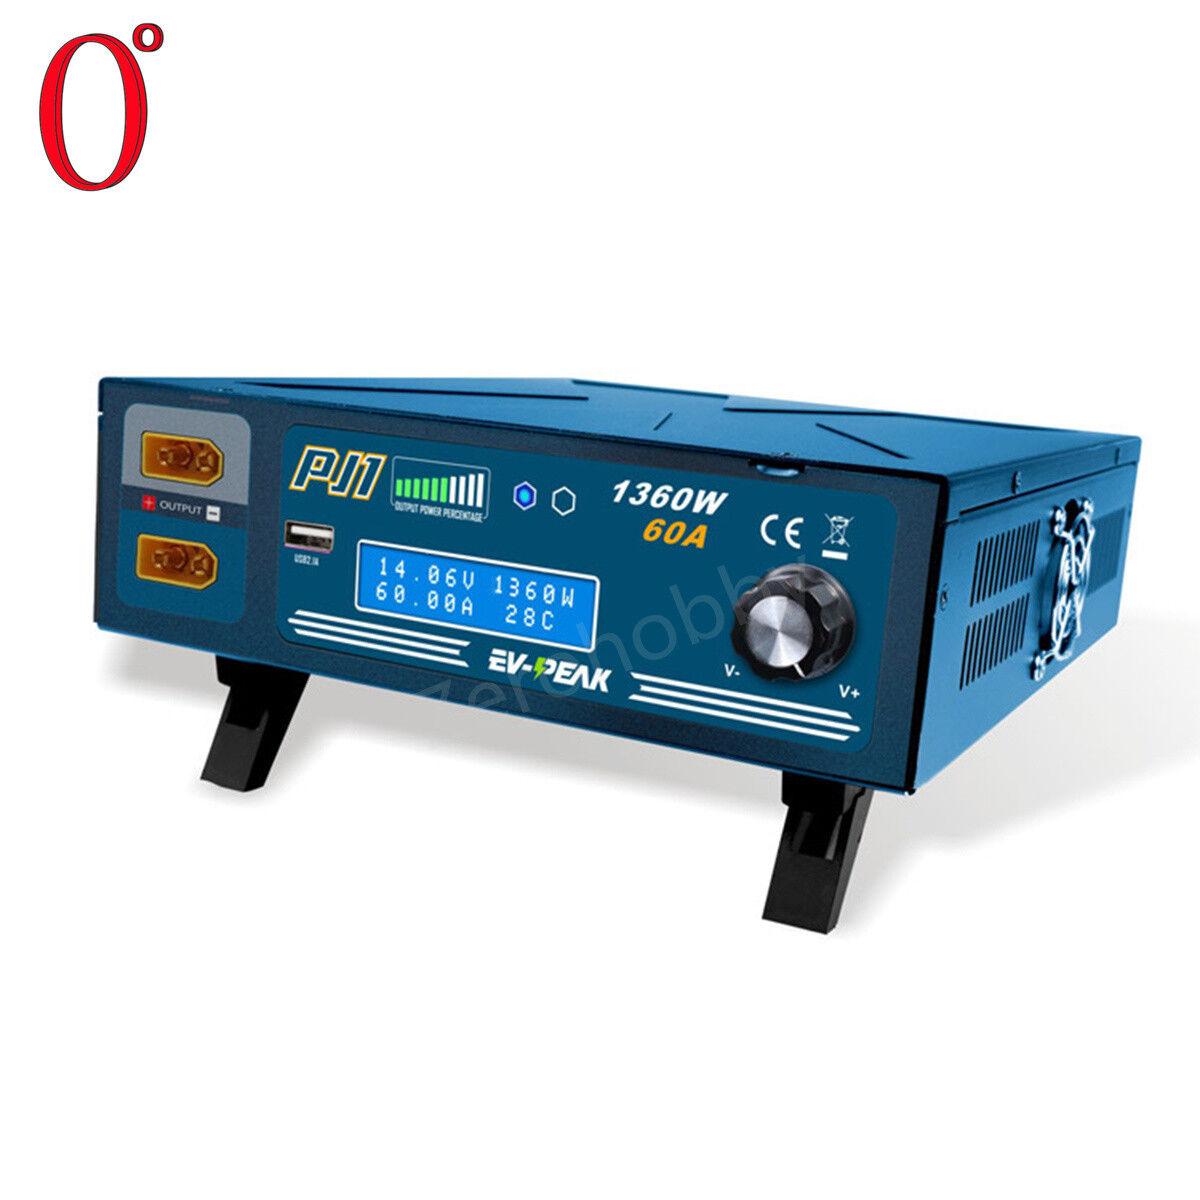 EV-Peak PJ1  eCube 1360W energia Supply w USB Port  negozio online